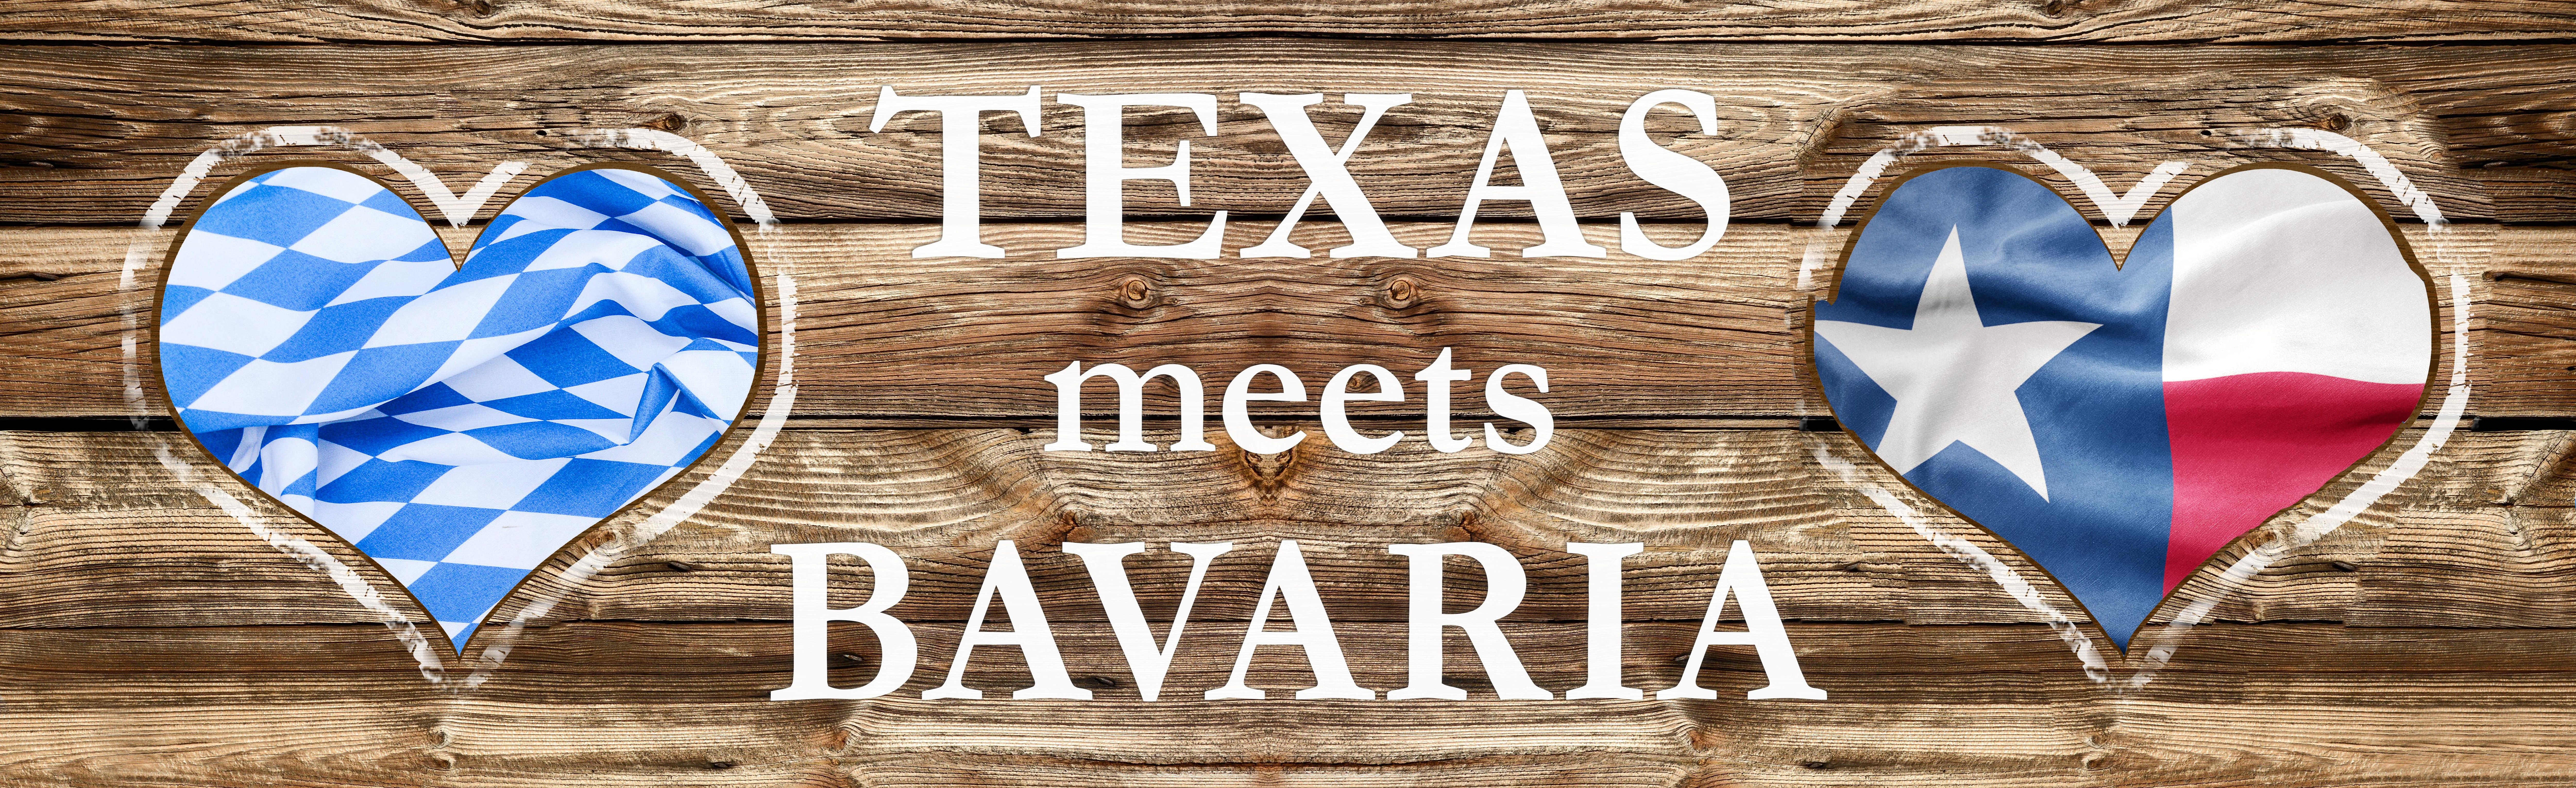 Texas meets Bavaria